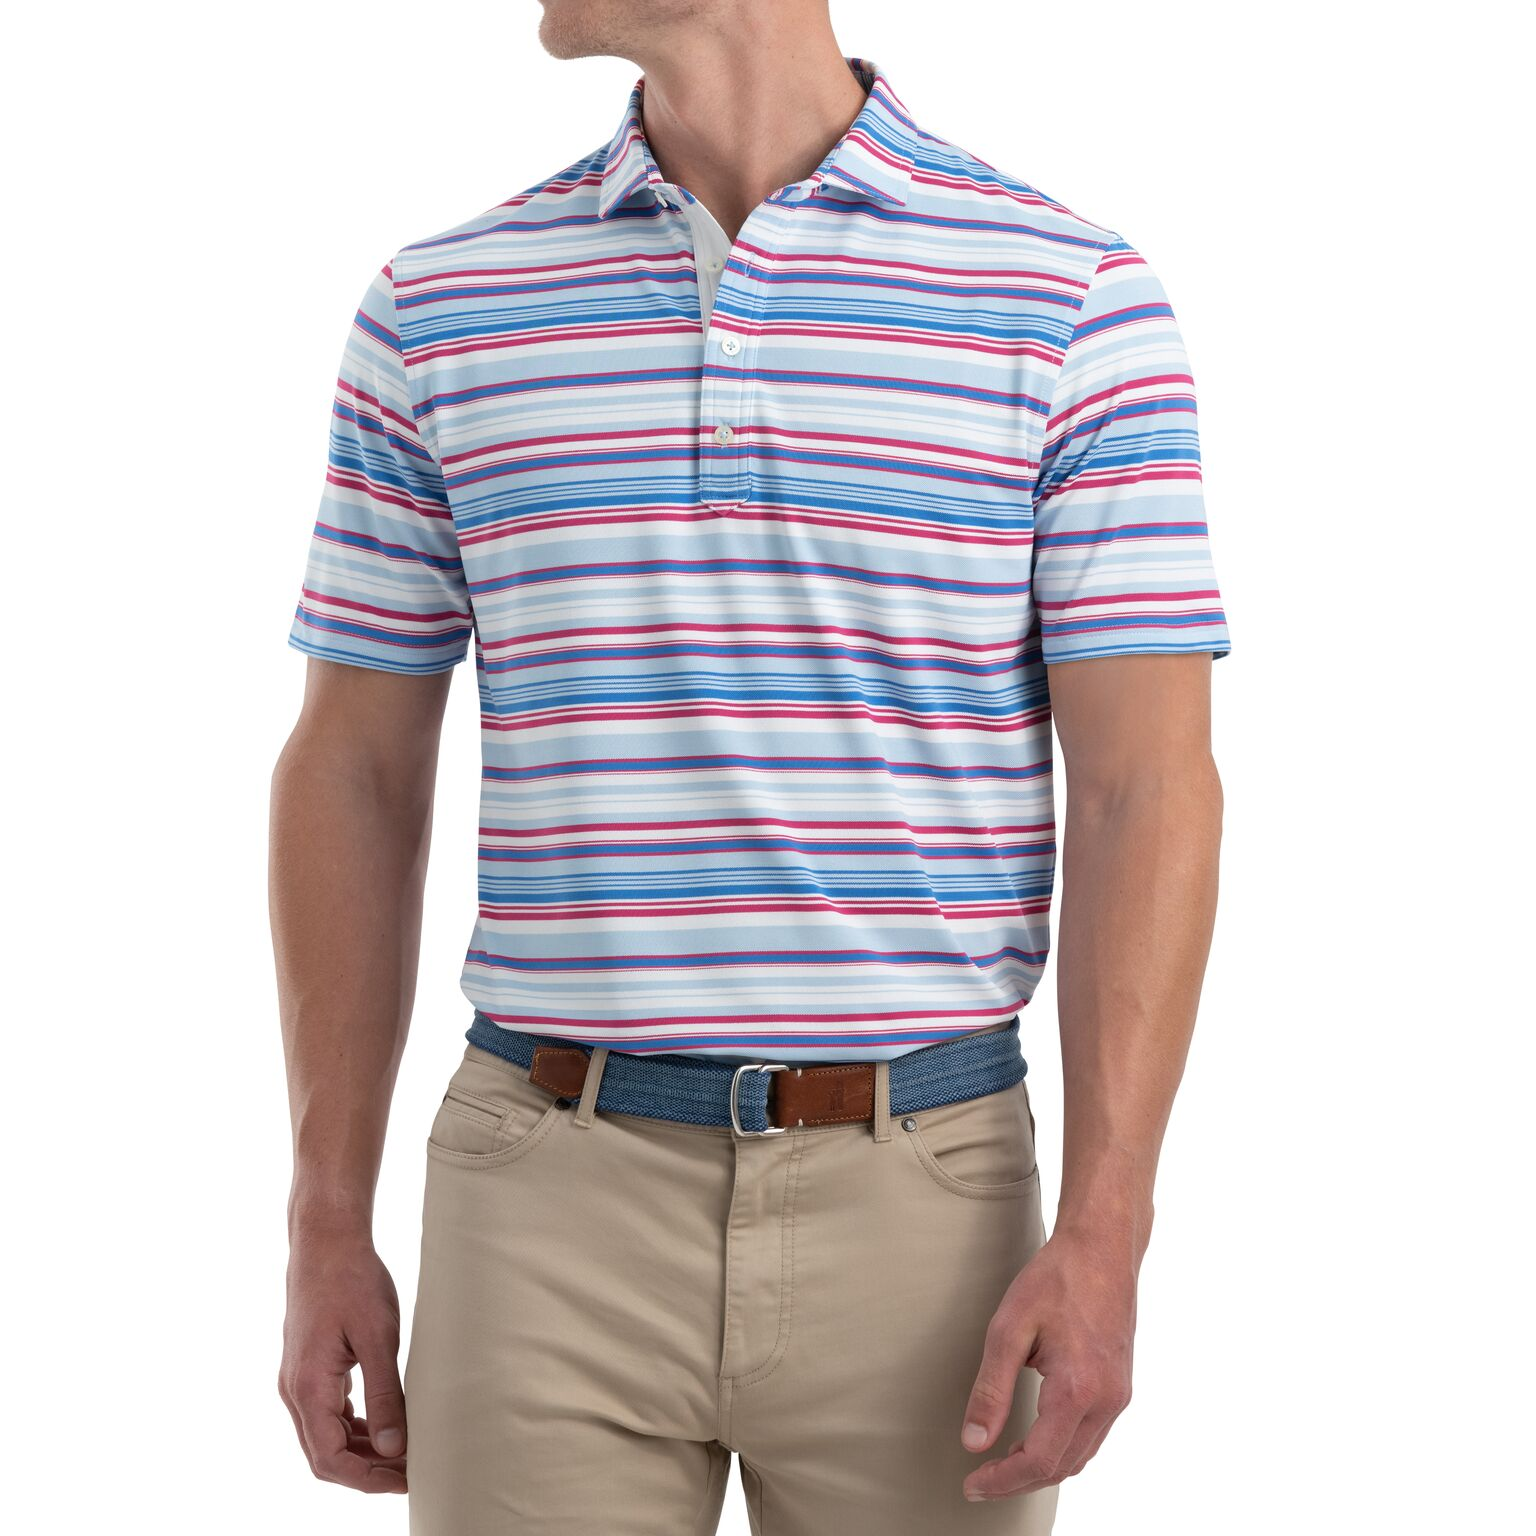 Seger Striped PREP-FORMANCE Pique Polo (Gulf Blue)